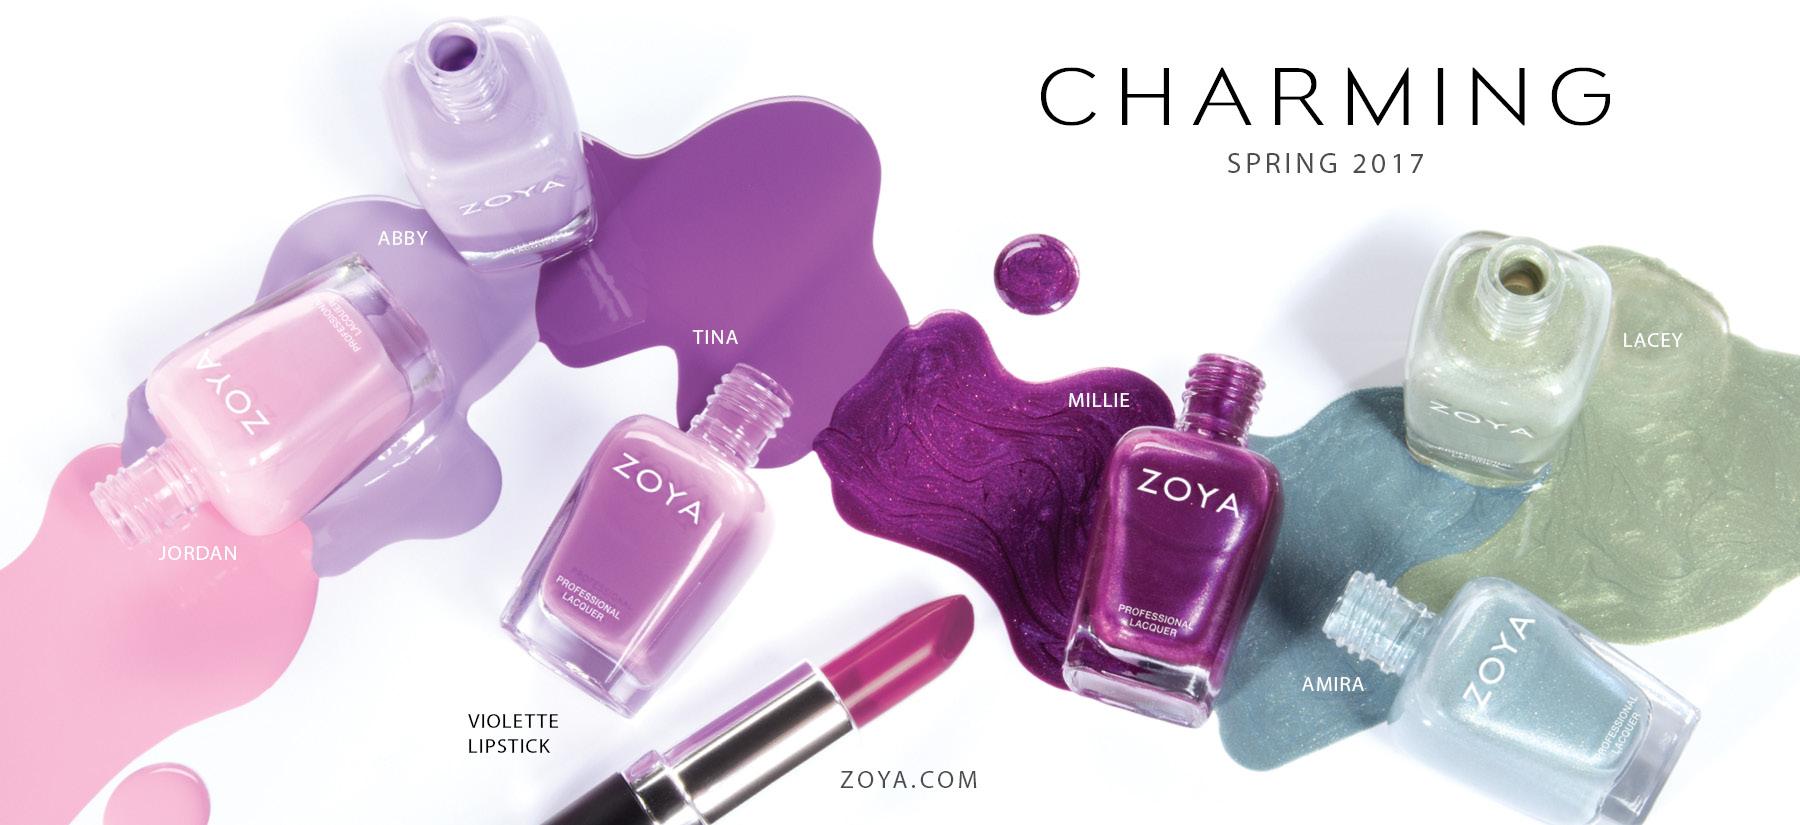 Zoya Charming Spring 2017